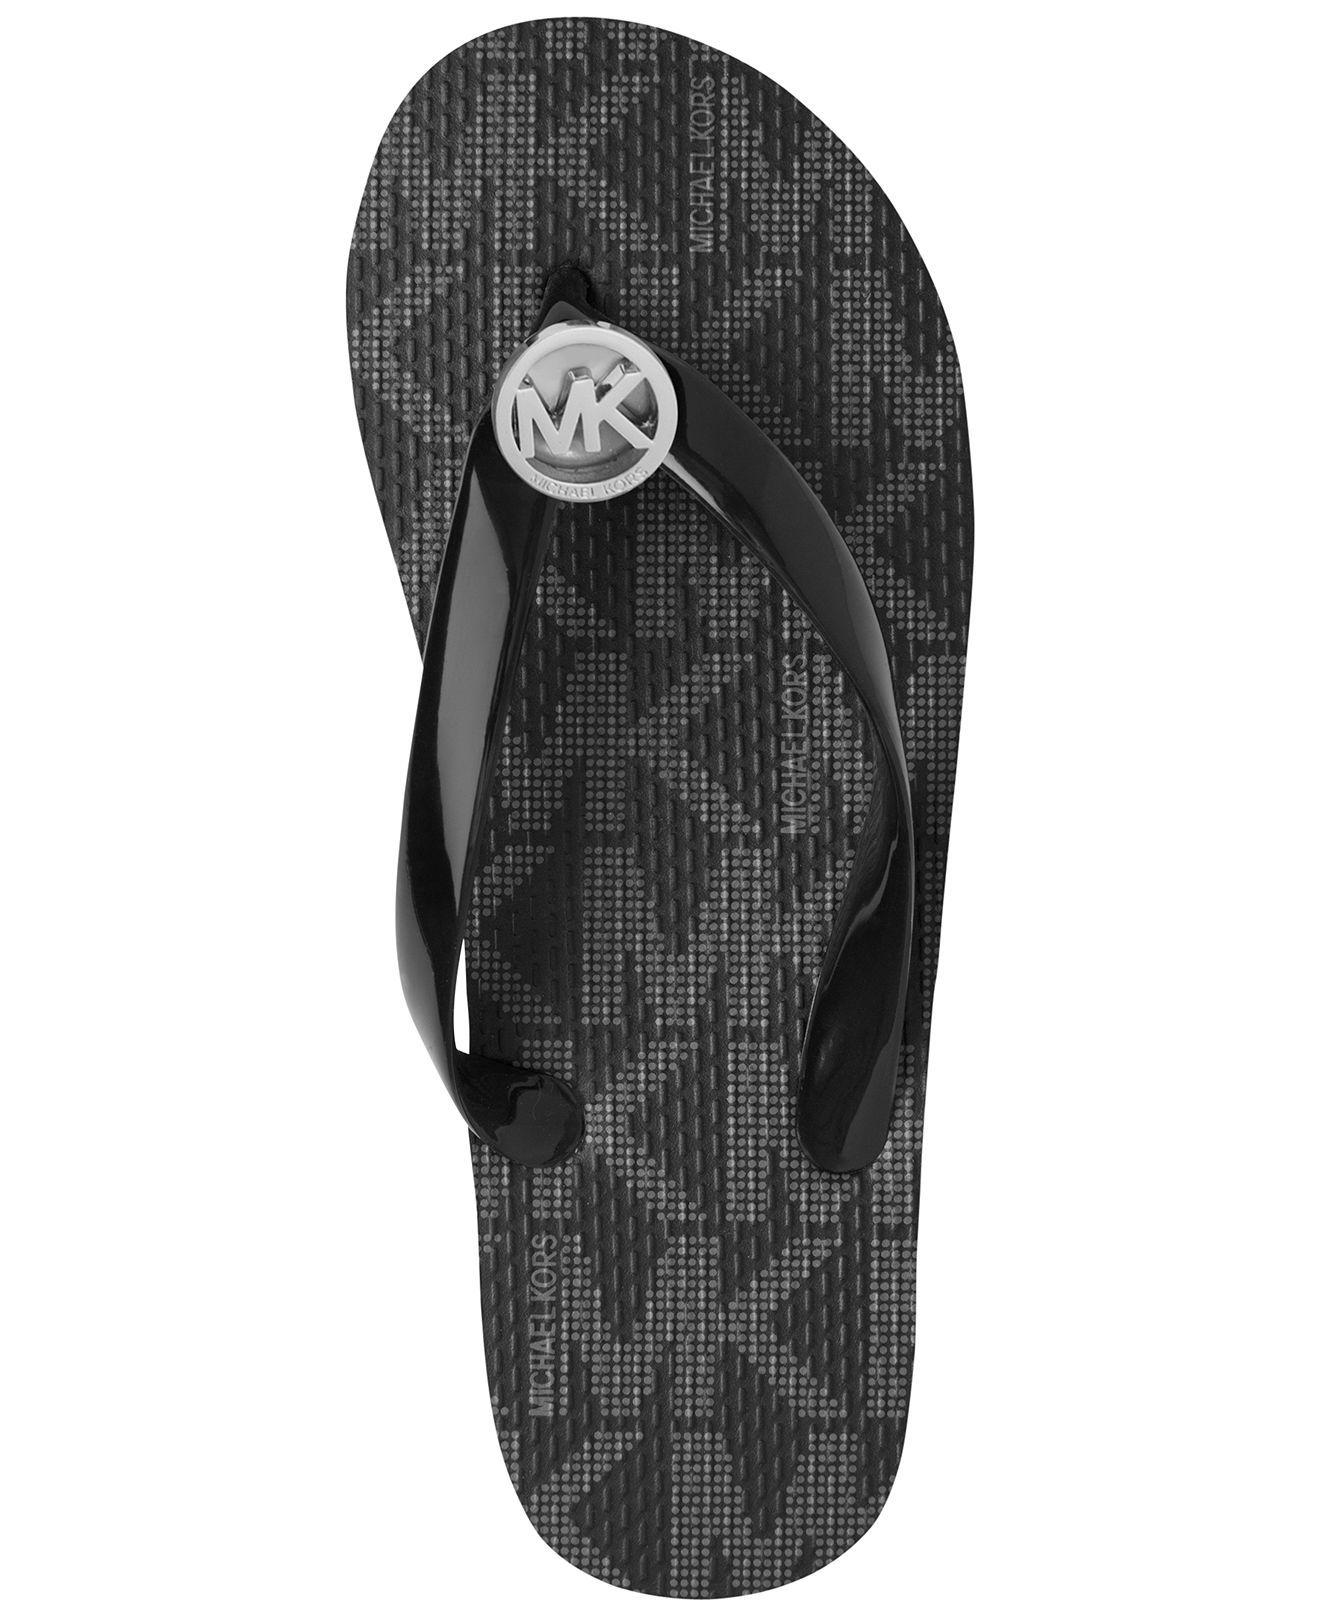 Handbags michael kors, Flip flop shoes